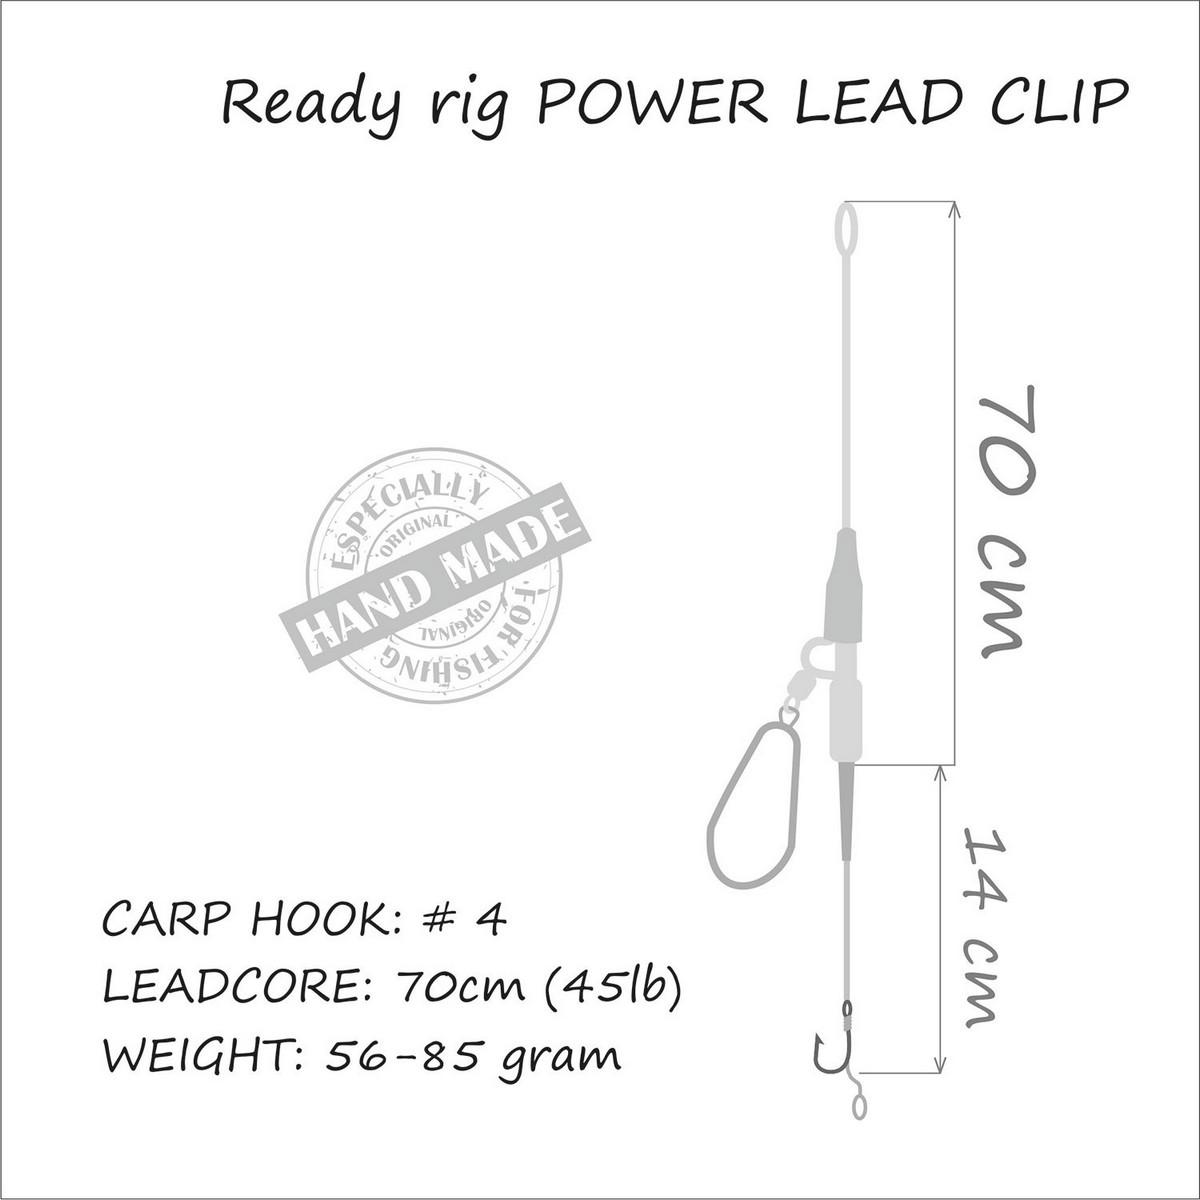 MONTURA LIFE-ORANGE POWER LEAD CLIP 85G - OEMF3-985